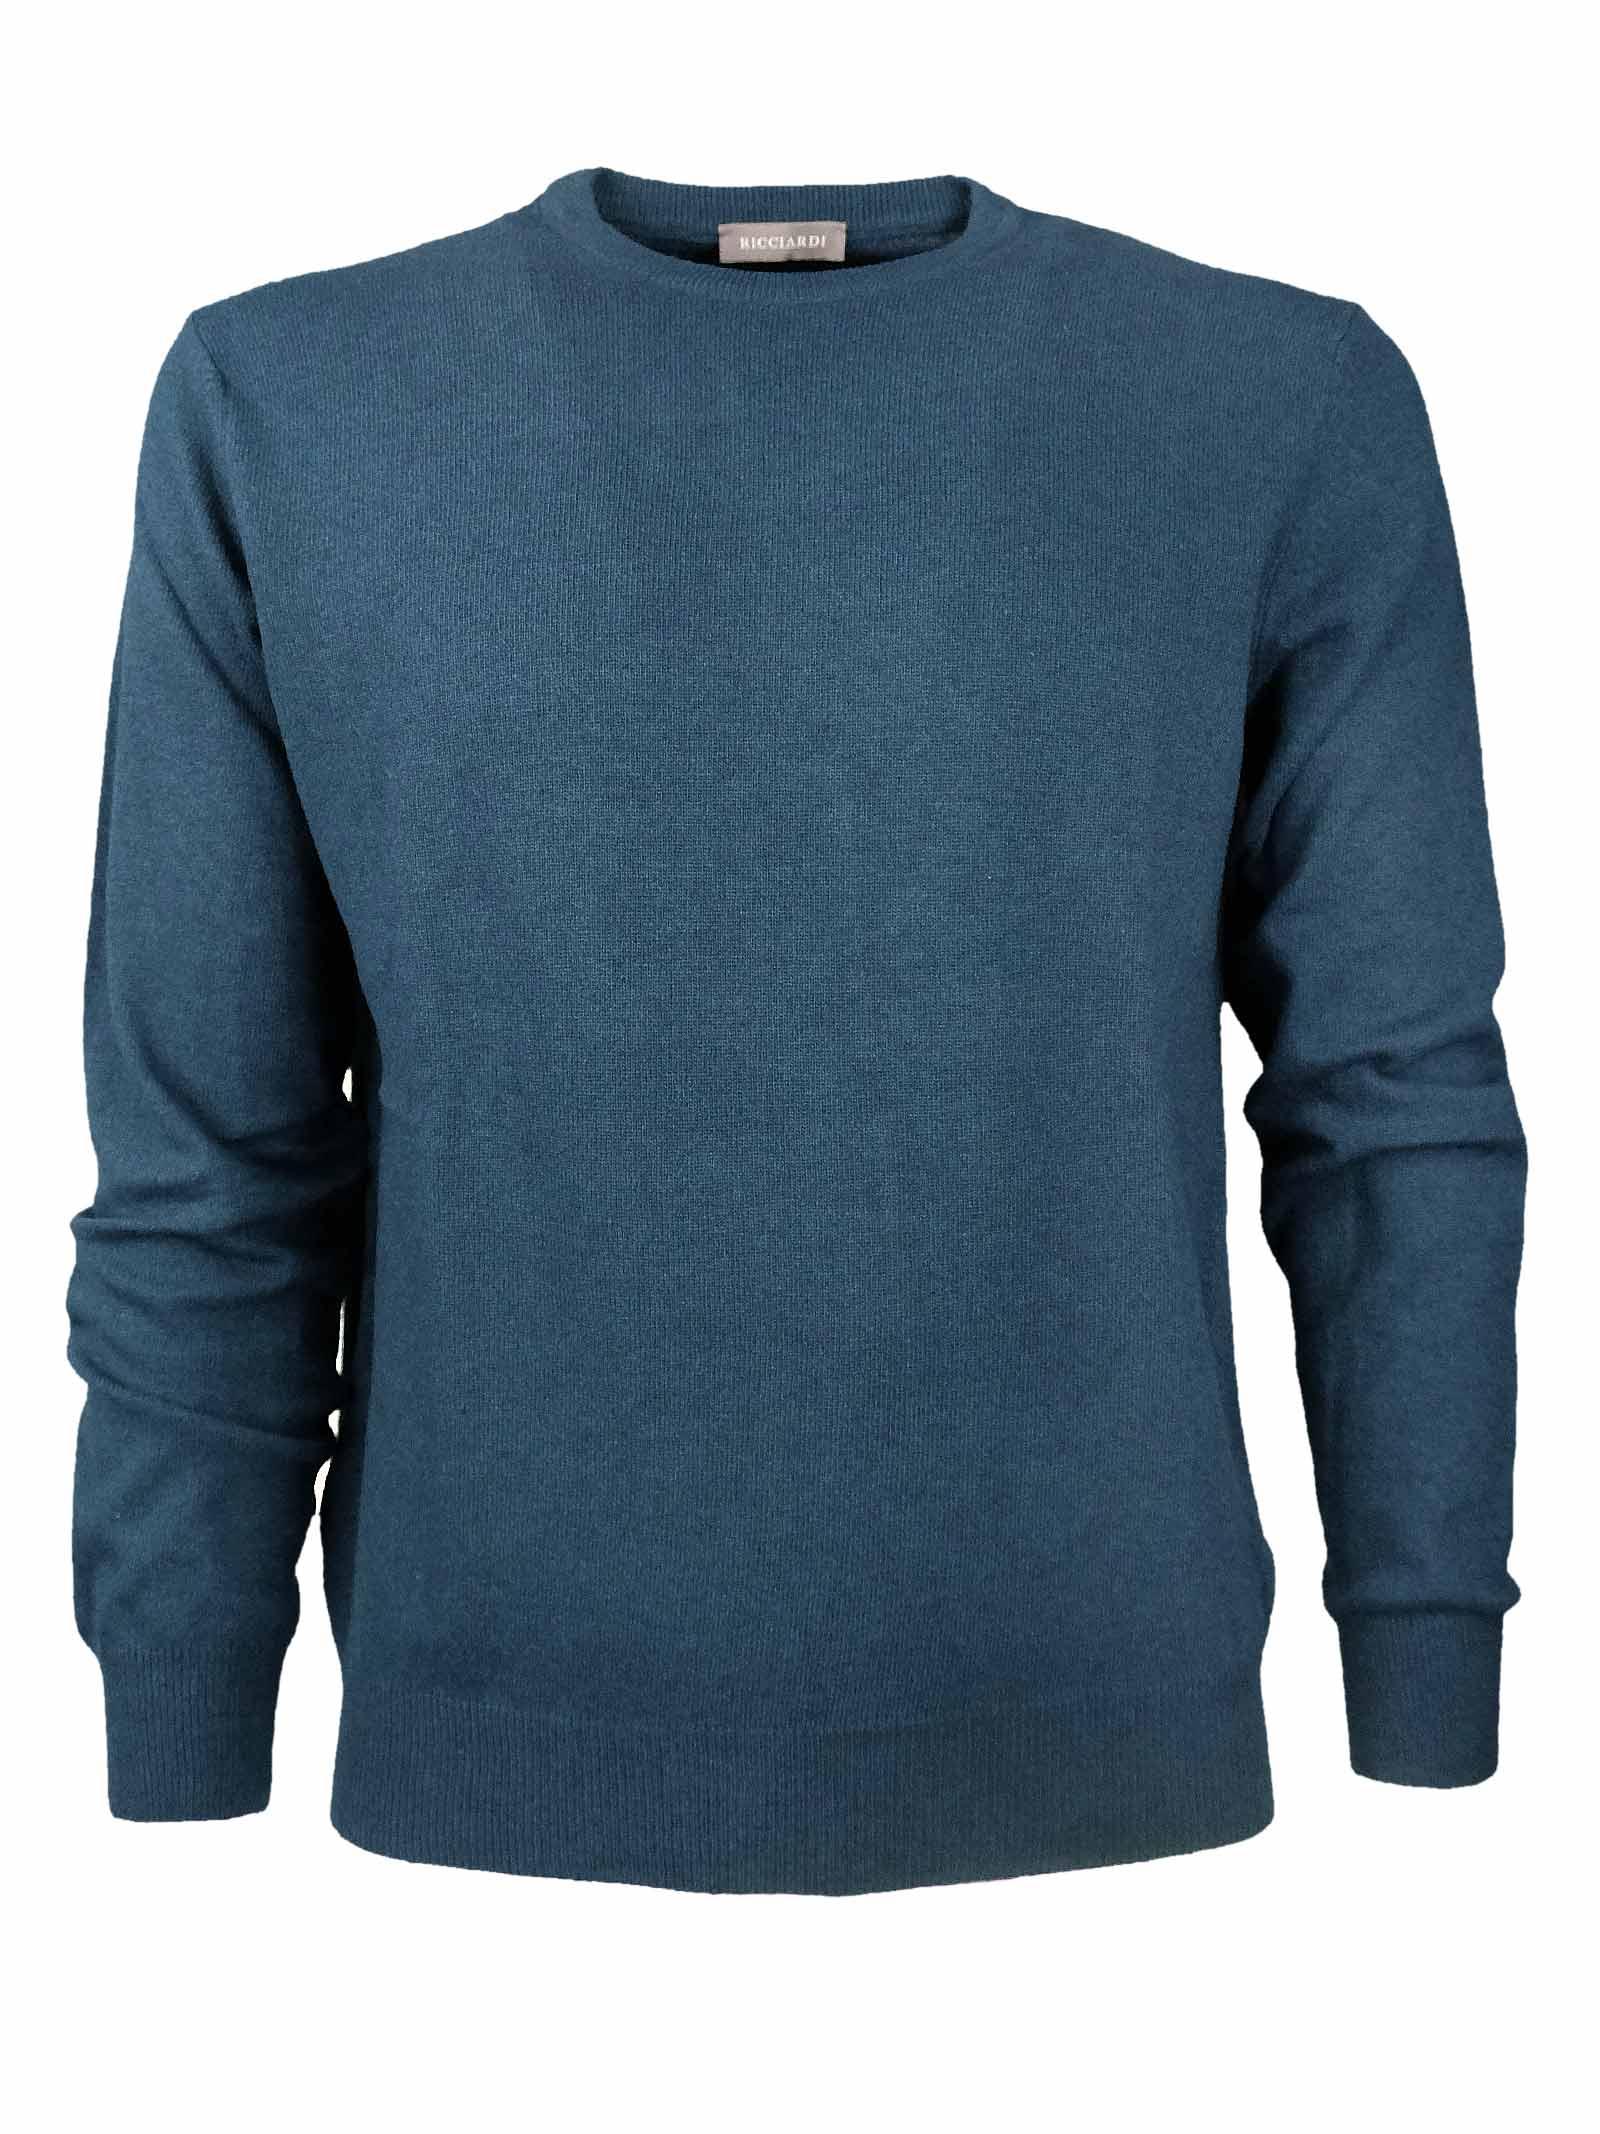 ROUNDNECK PULLOVER RICCIARDI | Knitwear | 45561130454